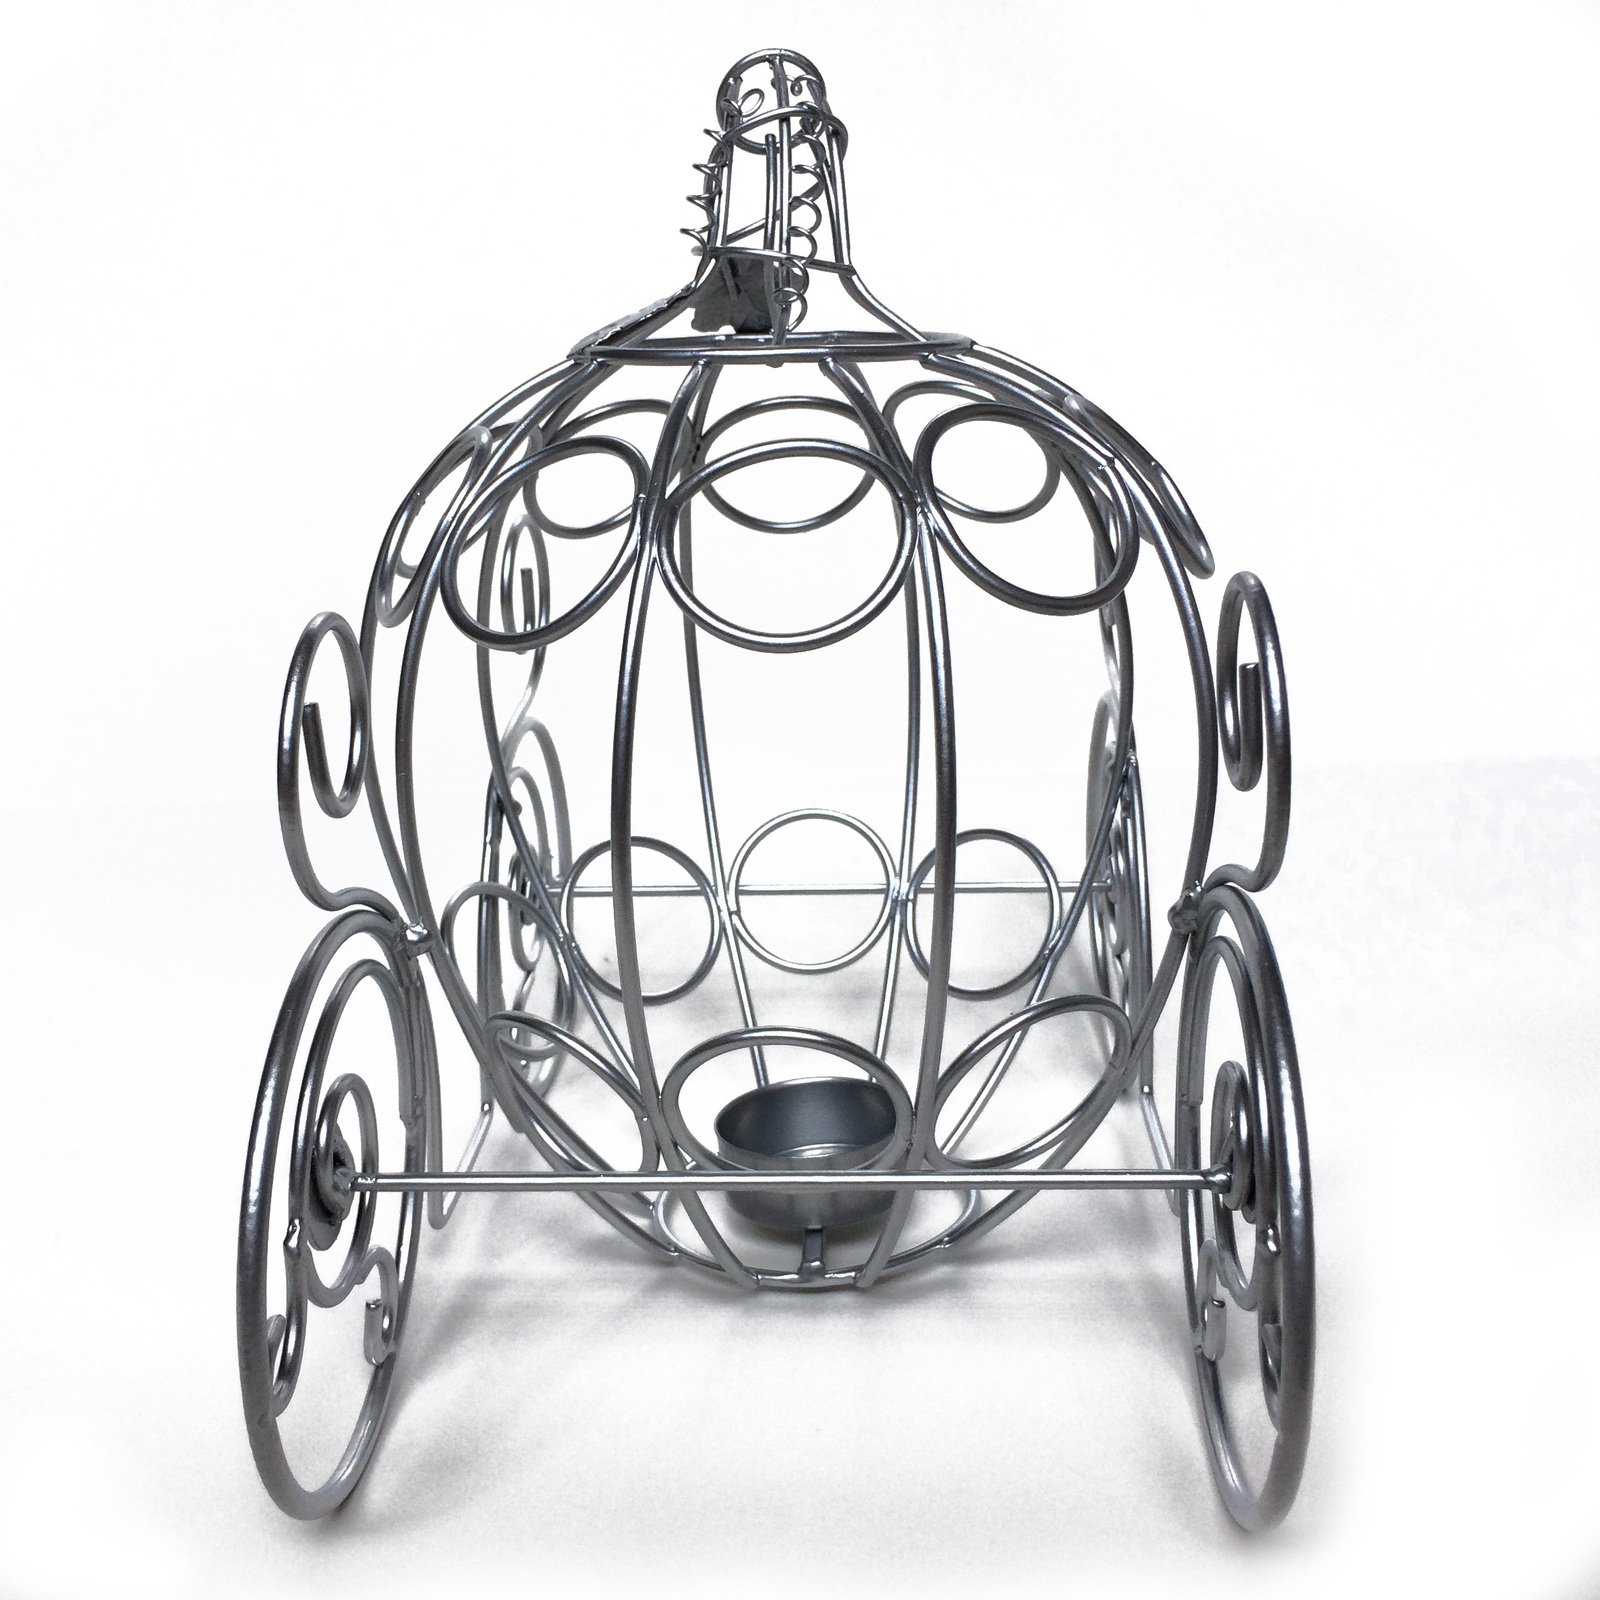 LAST CHANCE! Fairytale Dreams Centerpiece - Silver Metal Pumpkin Coach